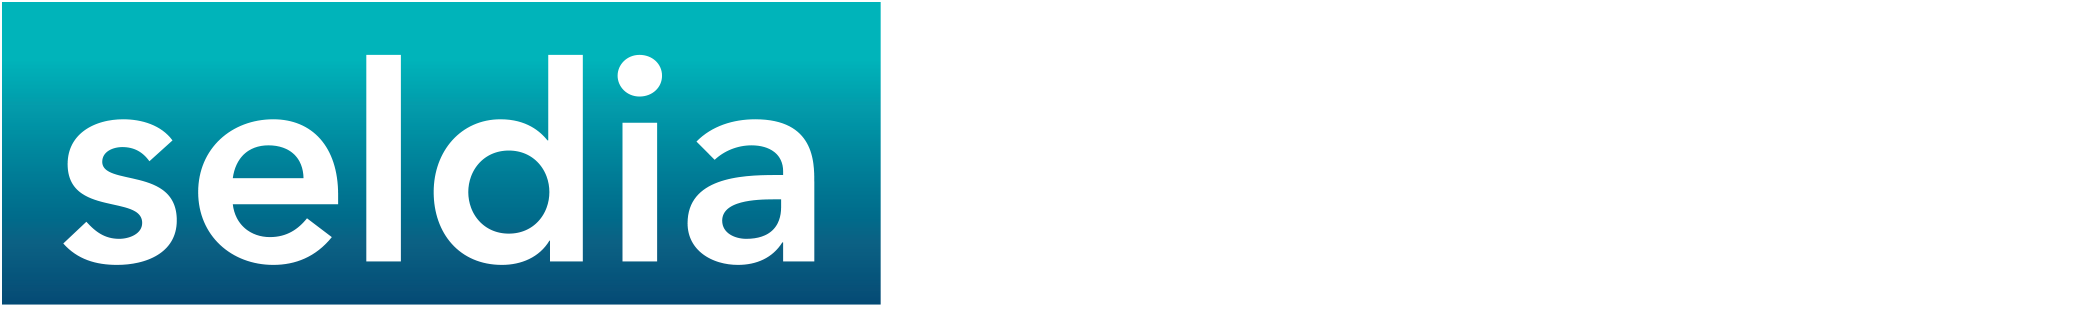 Seldia - European Direct Selling Association